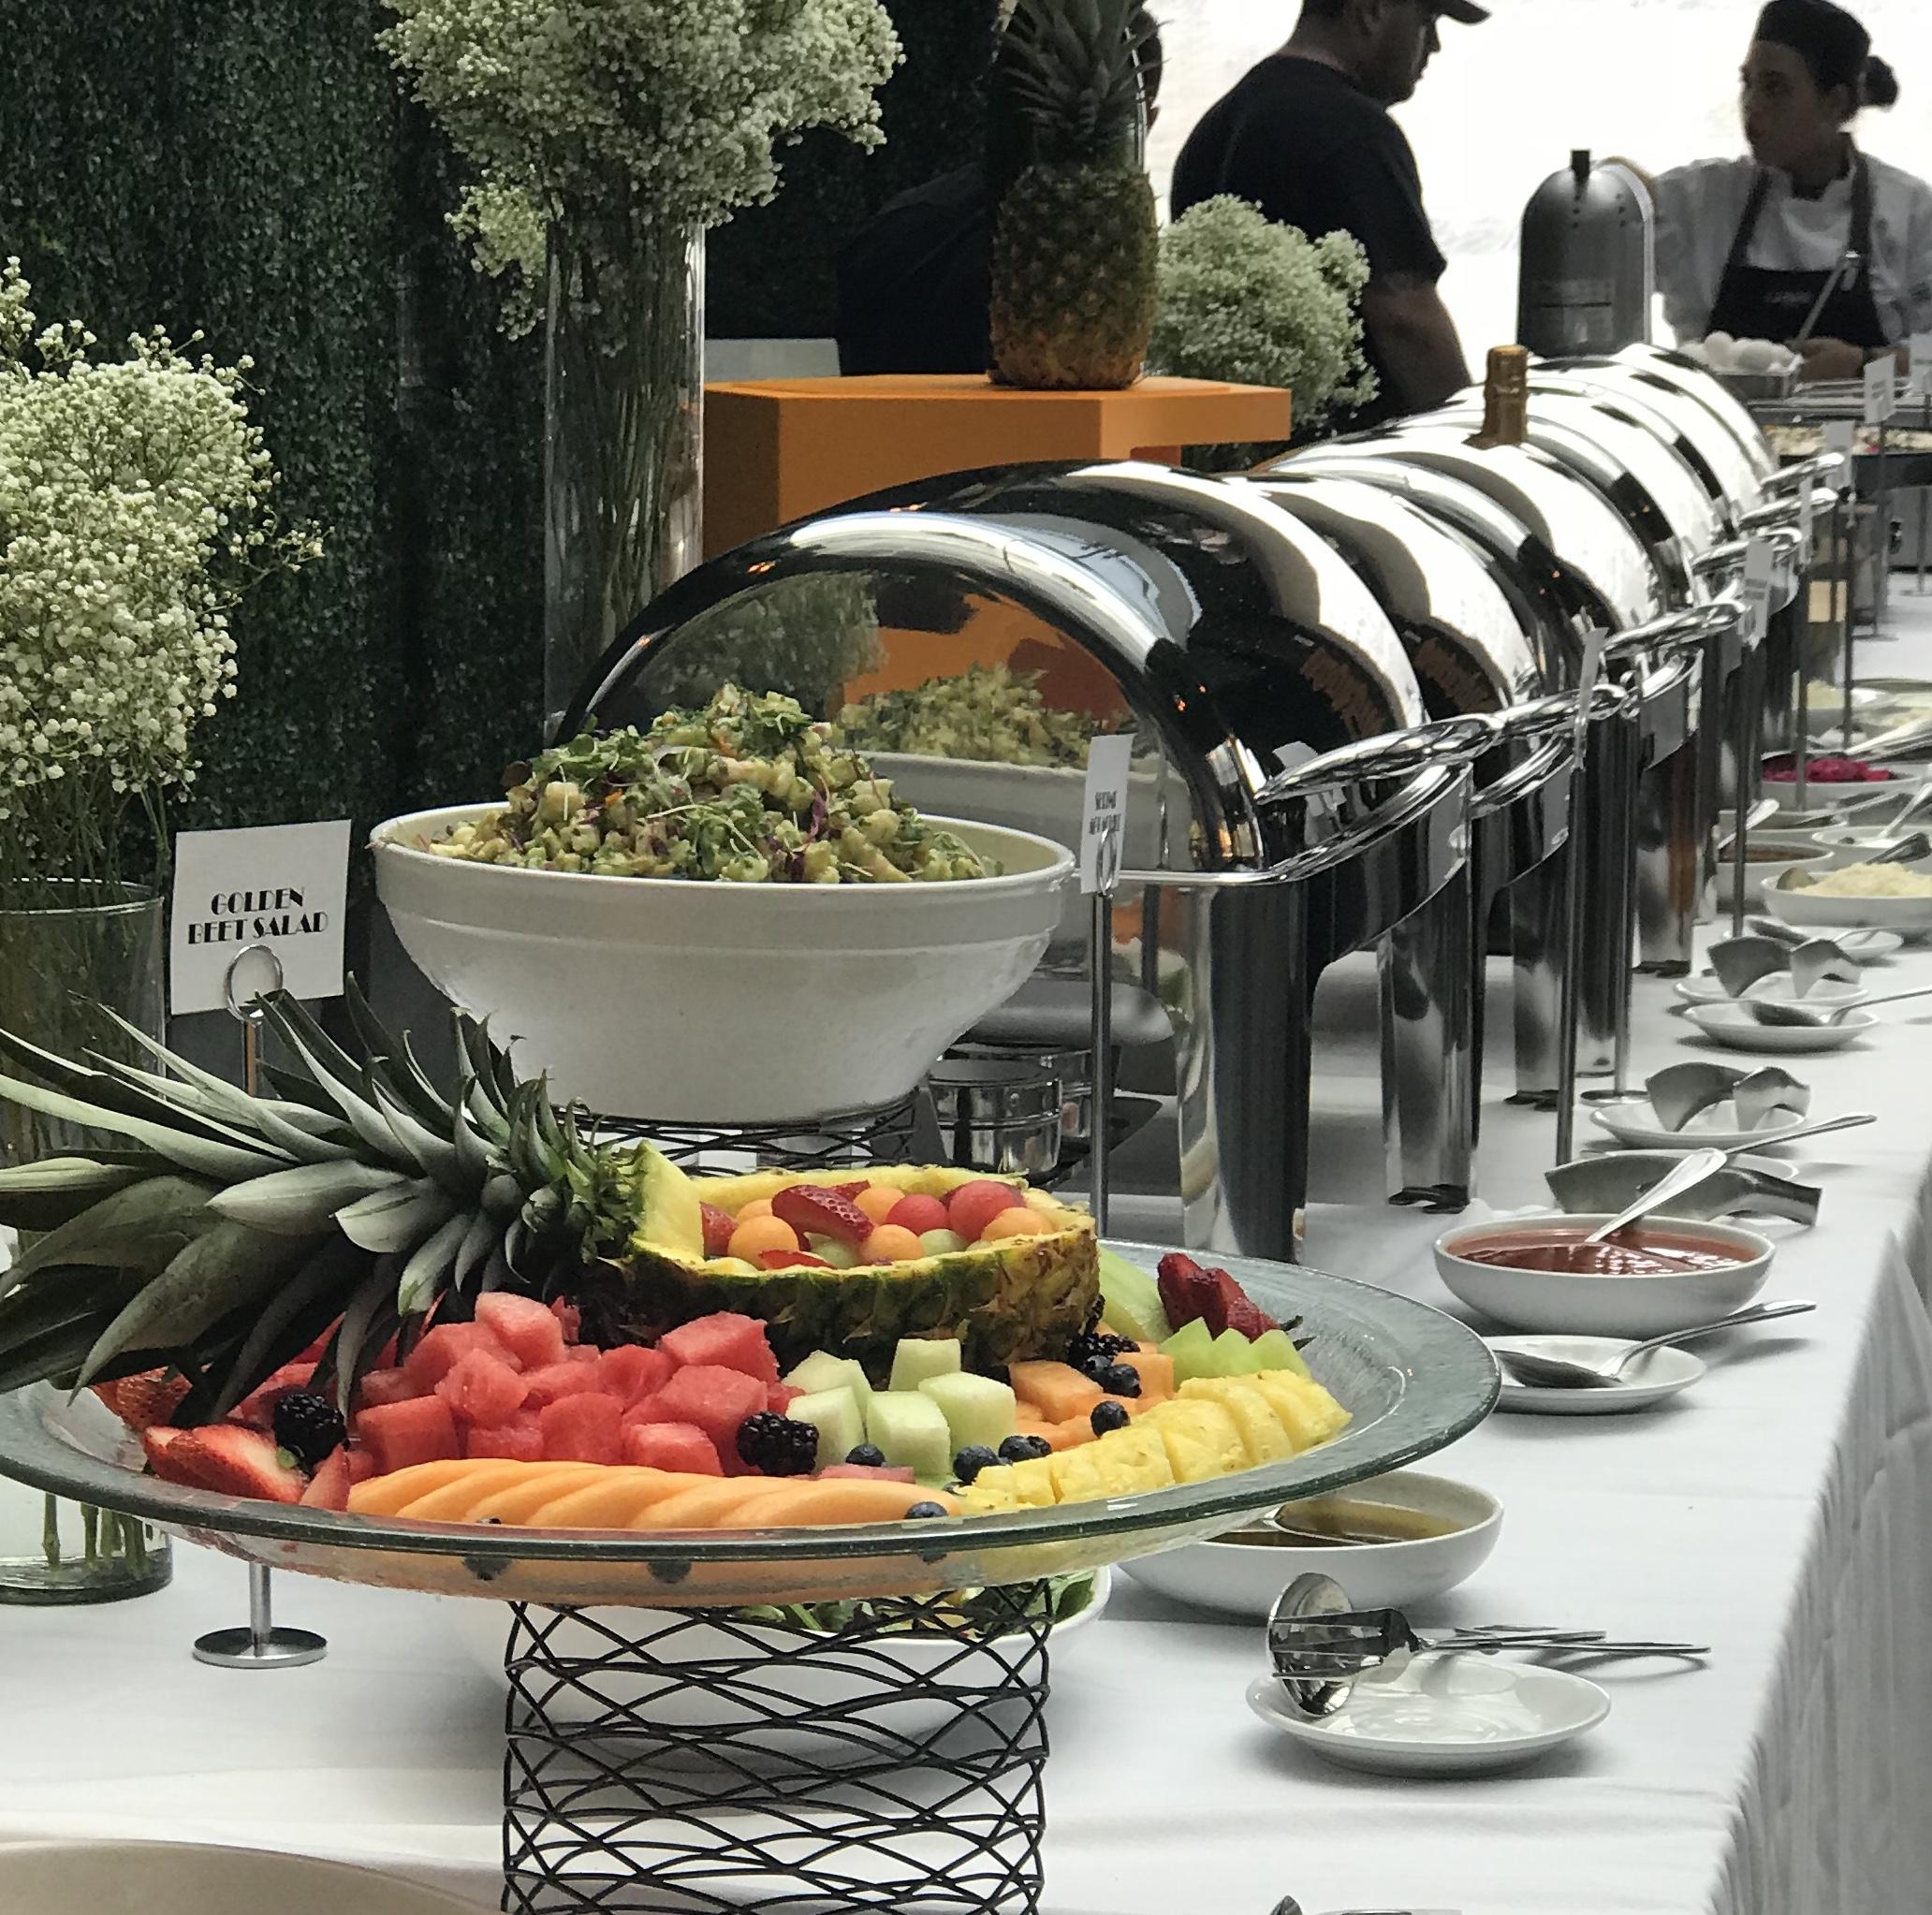 Cantina la Veinte Sunday Buffet Miami